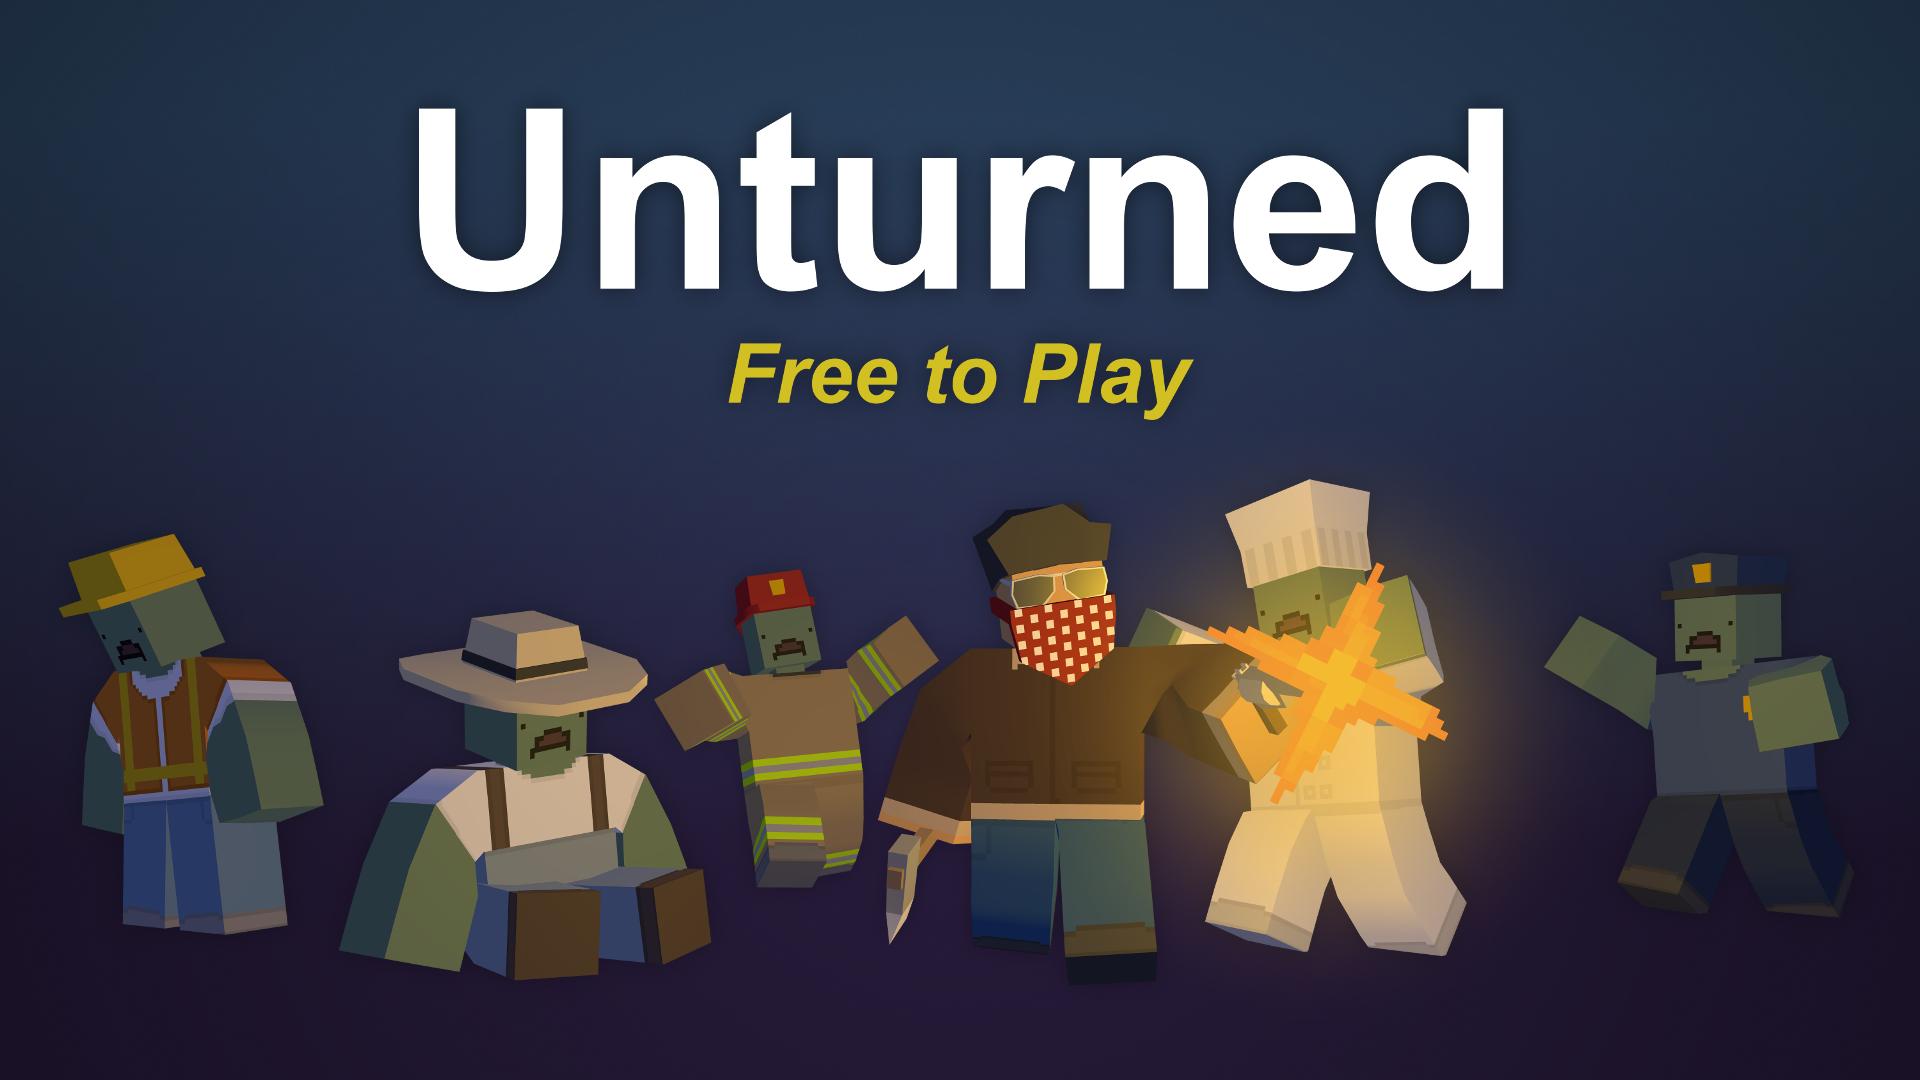 『Unturned』を日本語化する方法